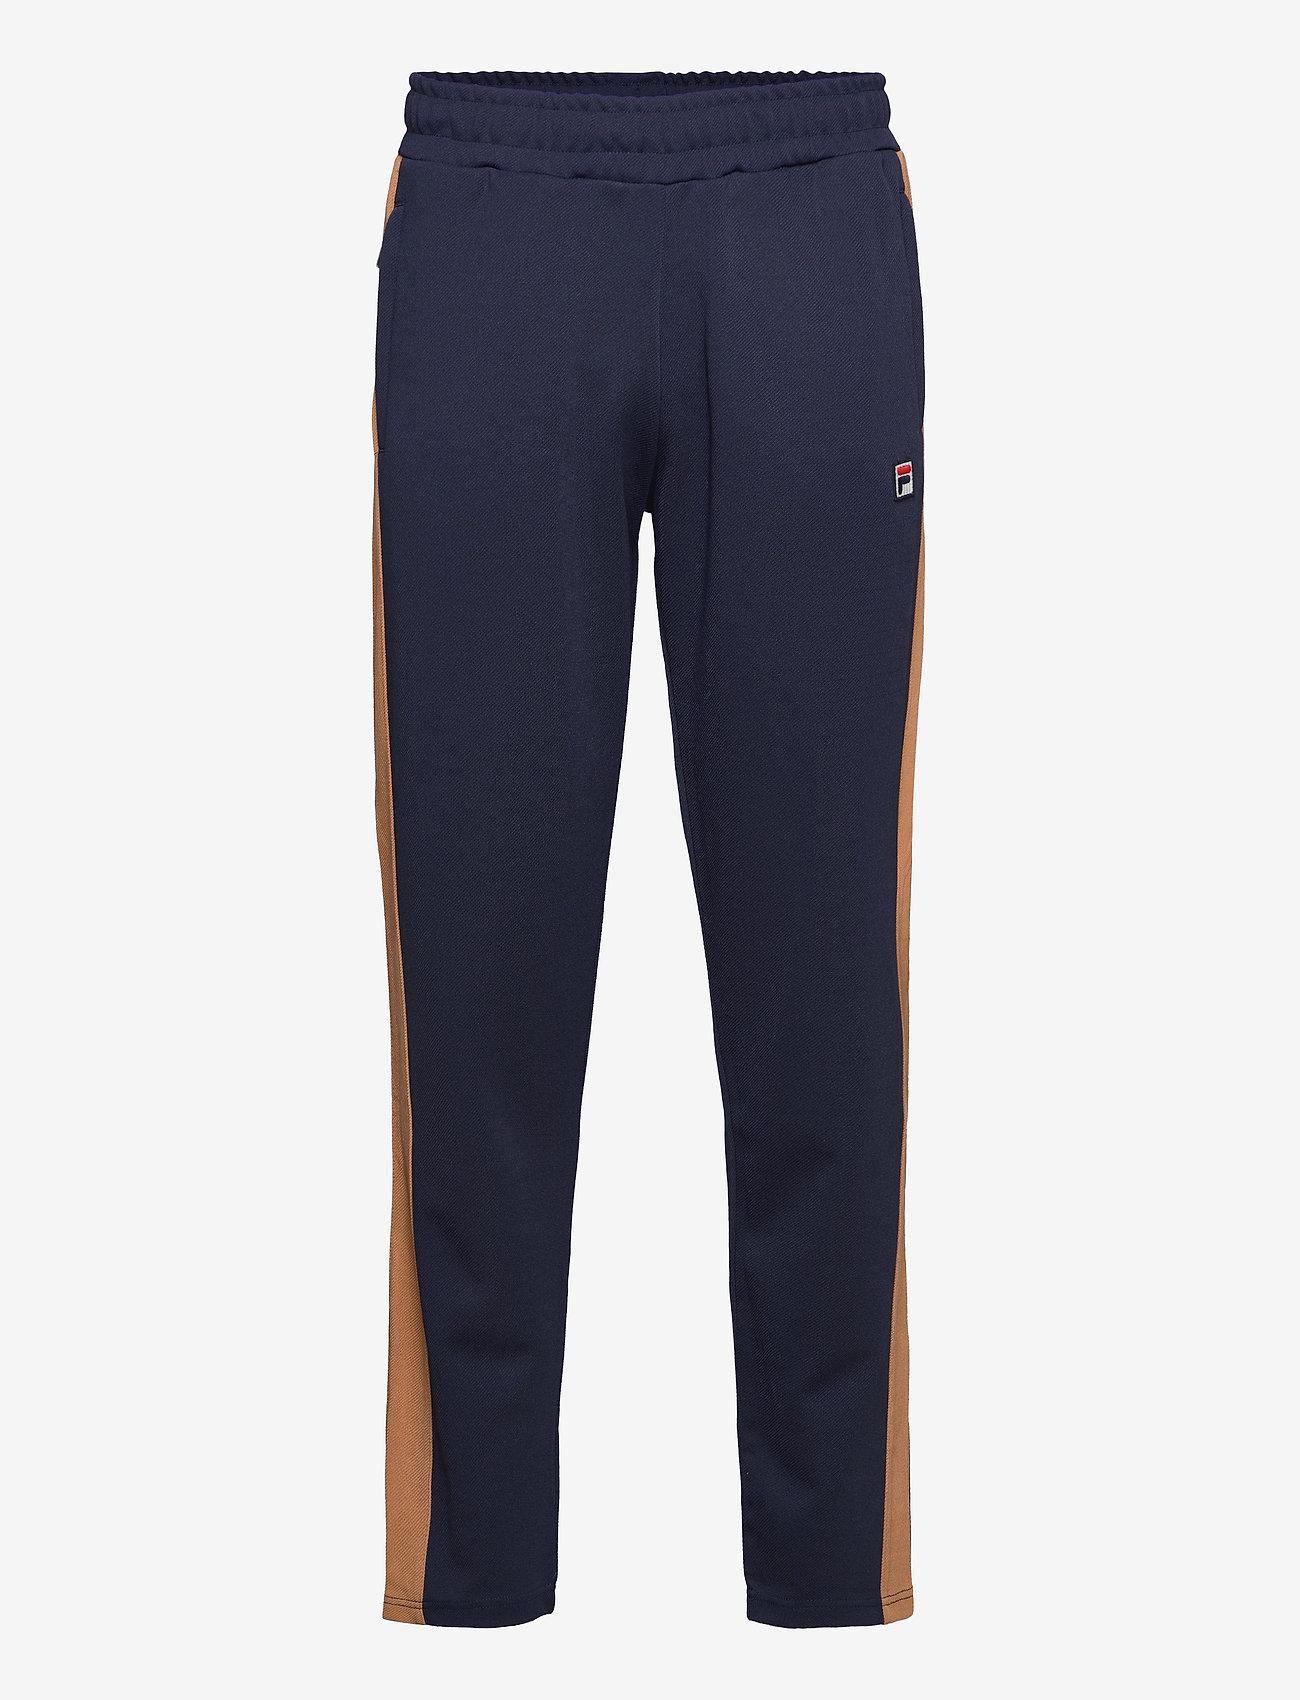 FILA - MEN HAVERD track pants - sale - black iris-hazel - 0